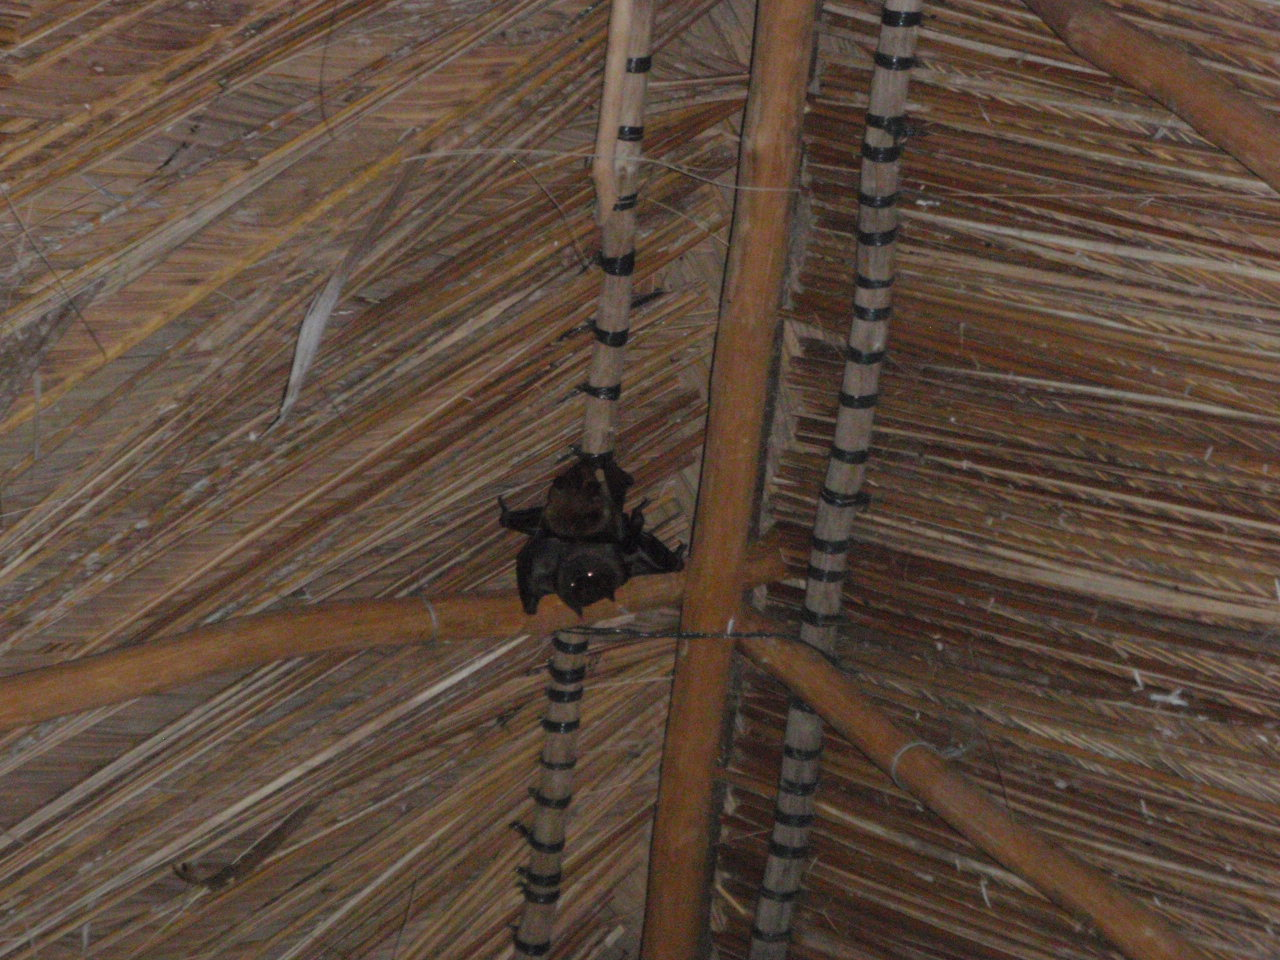 Click image for larger version  Name:Fruit Bats P9170009.JPG Views:62 Size:297.2 KB ID:49307